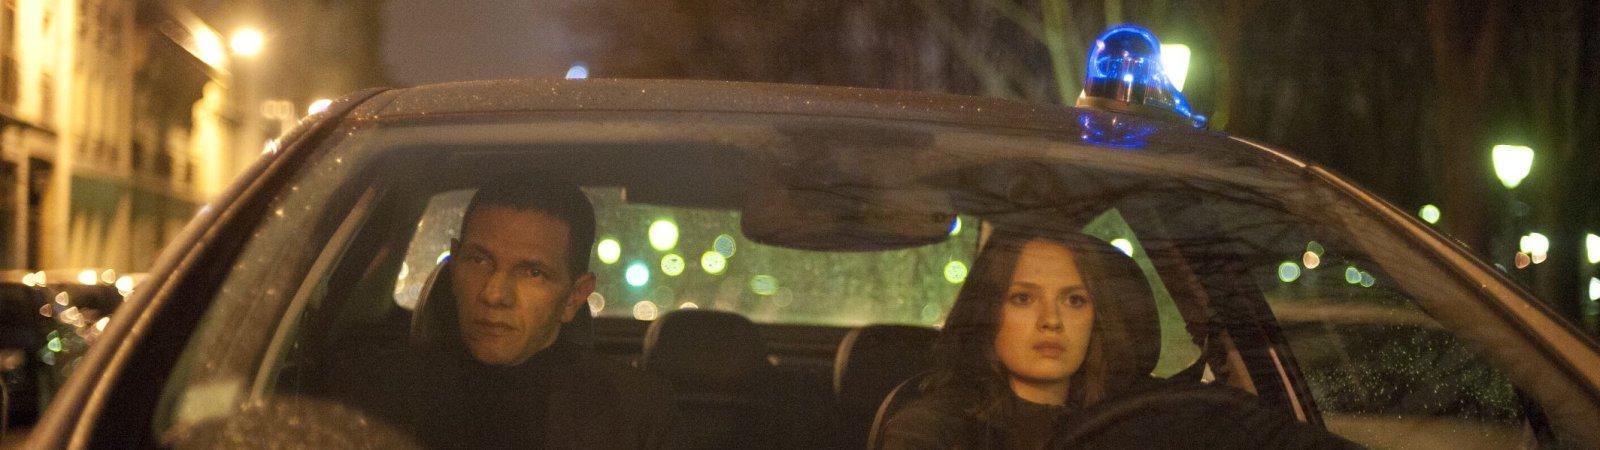 Photo dernier film Samuel Le Bihan